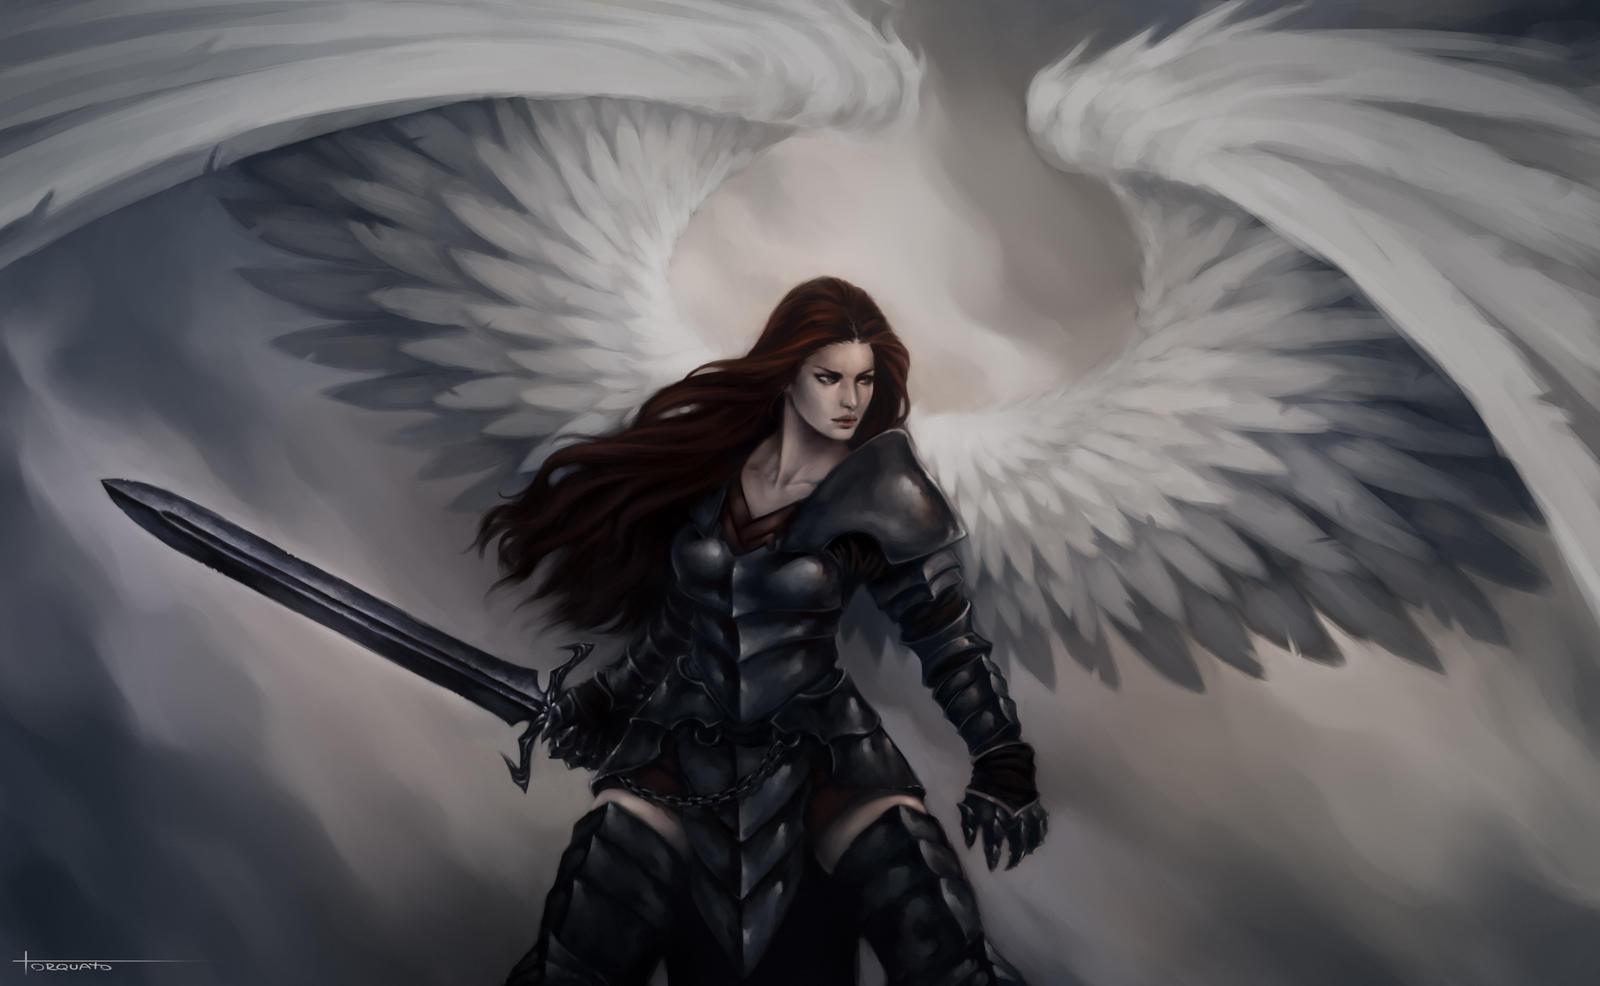 Warrior Angel - 23-06-12 by Lucastorquato27